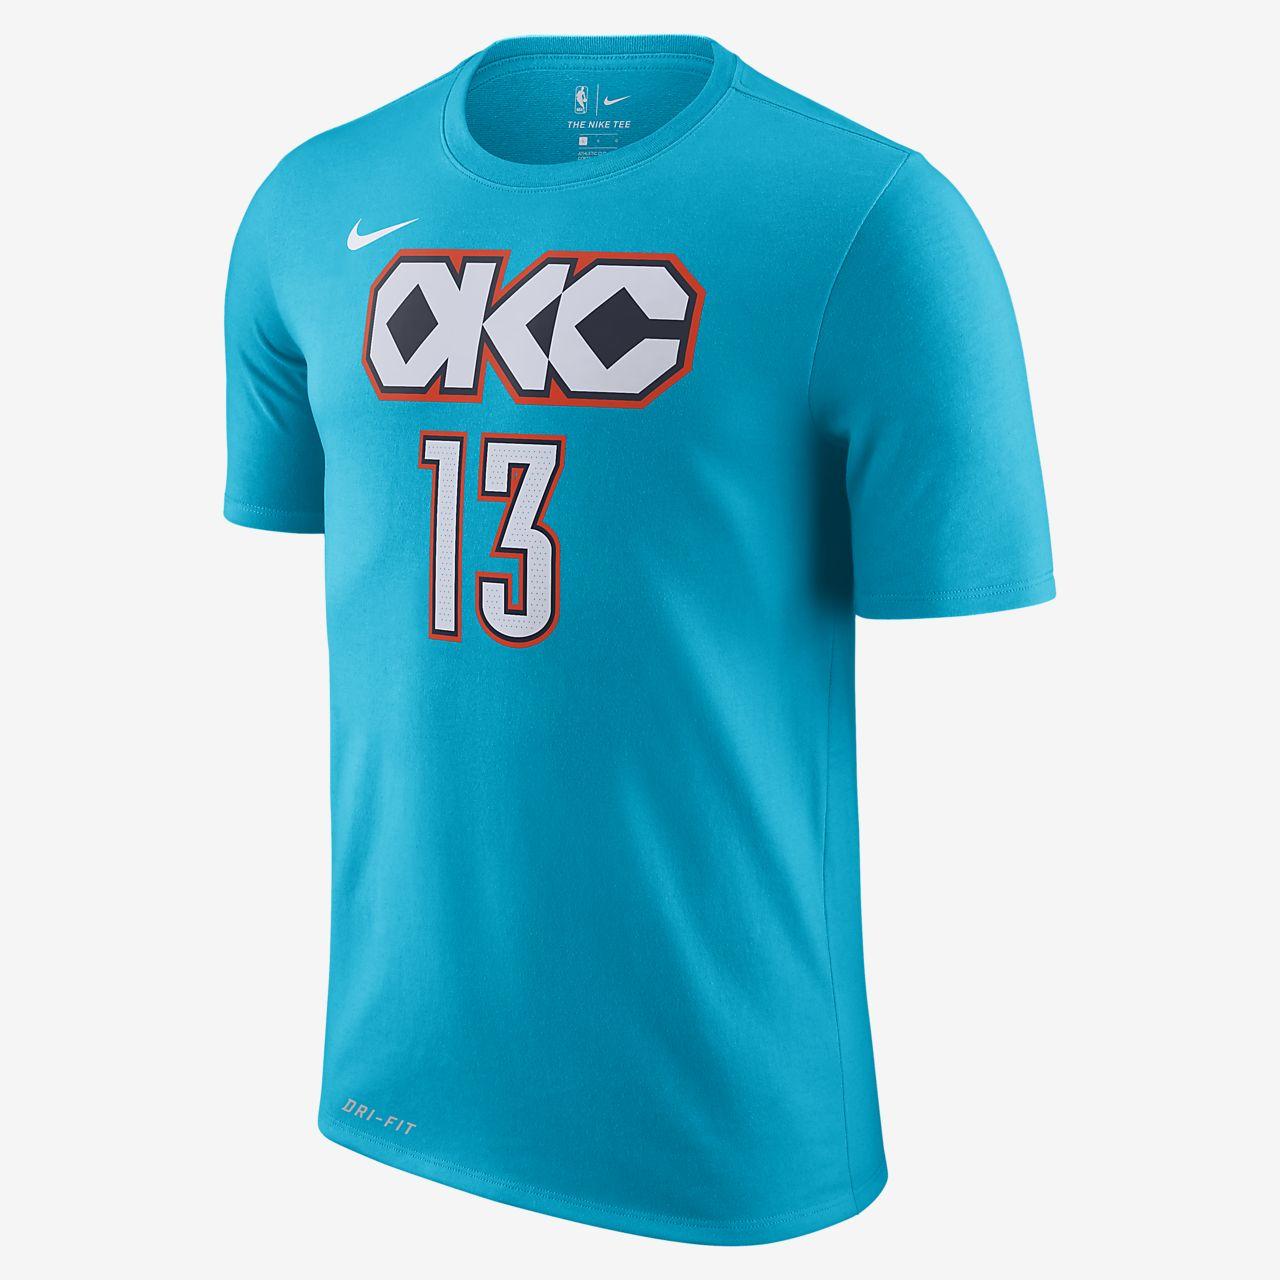 Paul George Oklahoma City Thunder City Edition Nike Dri-FIT Men's NBA T-Shirt